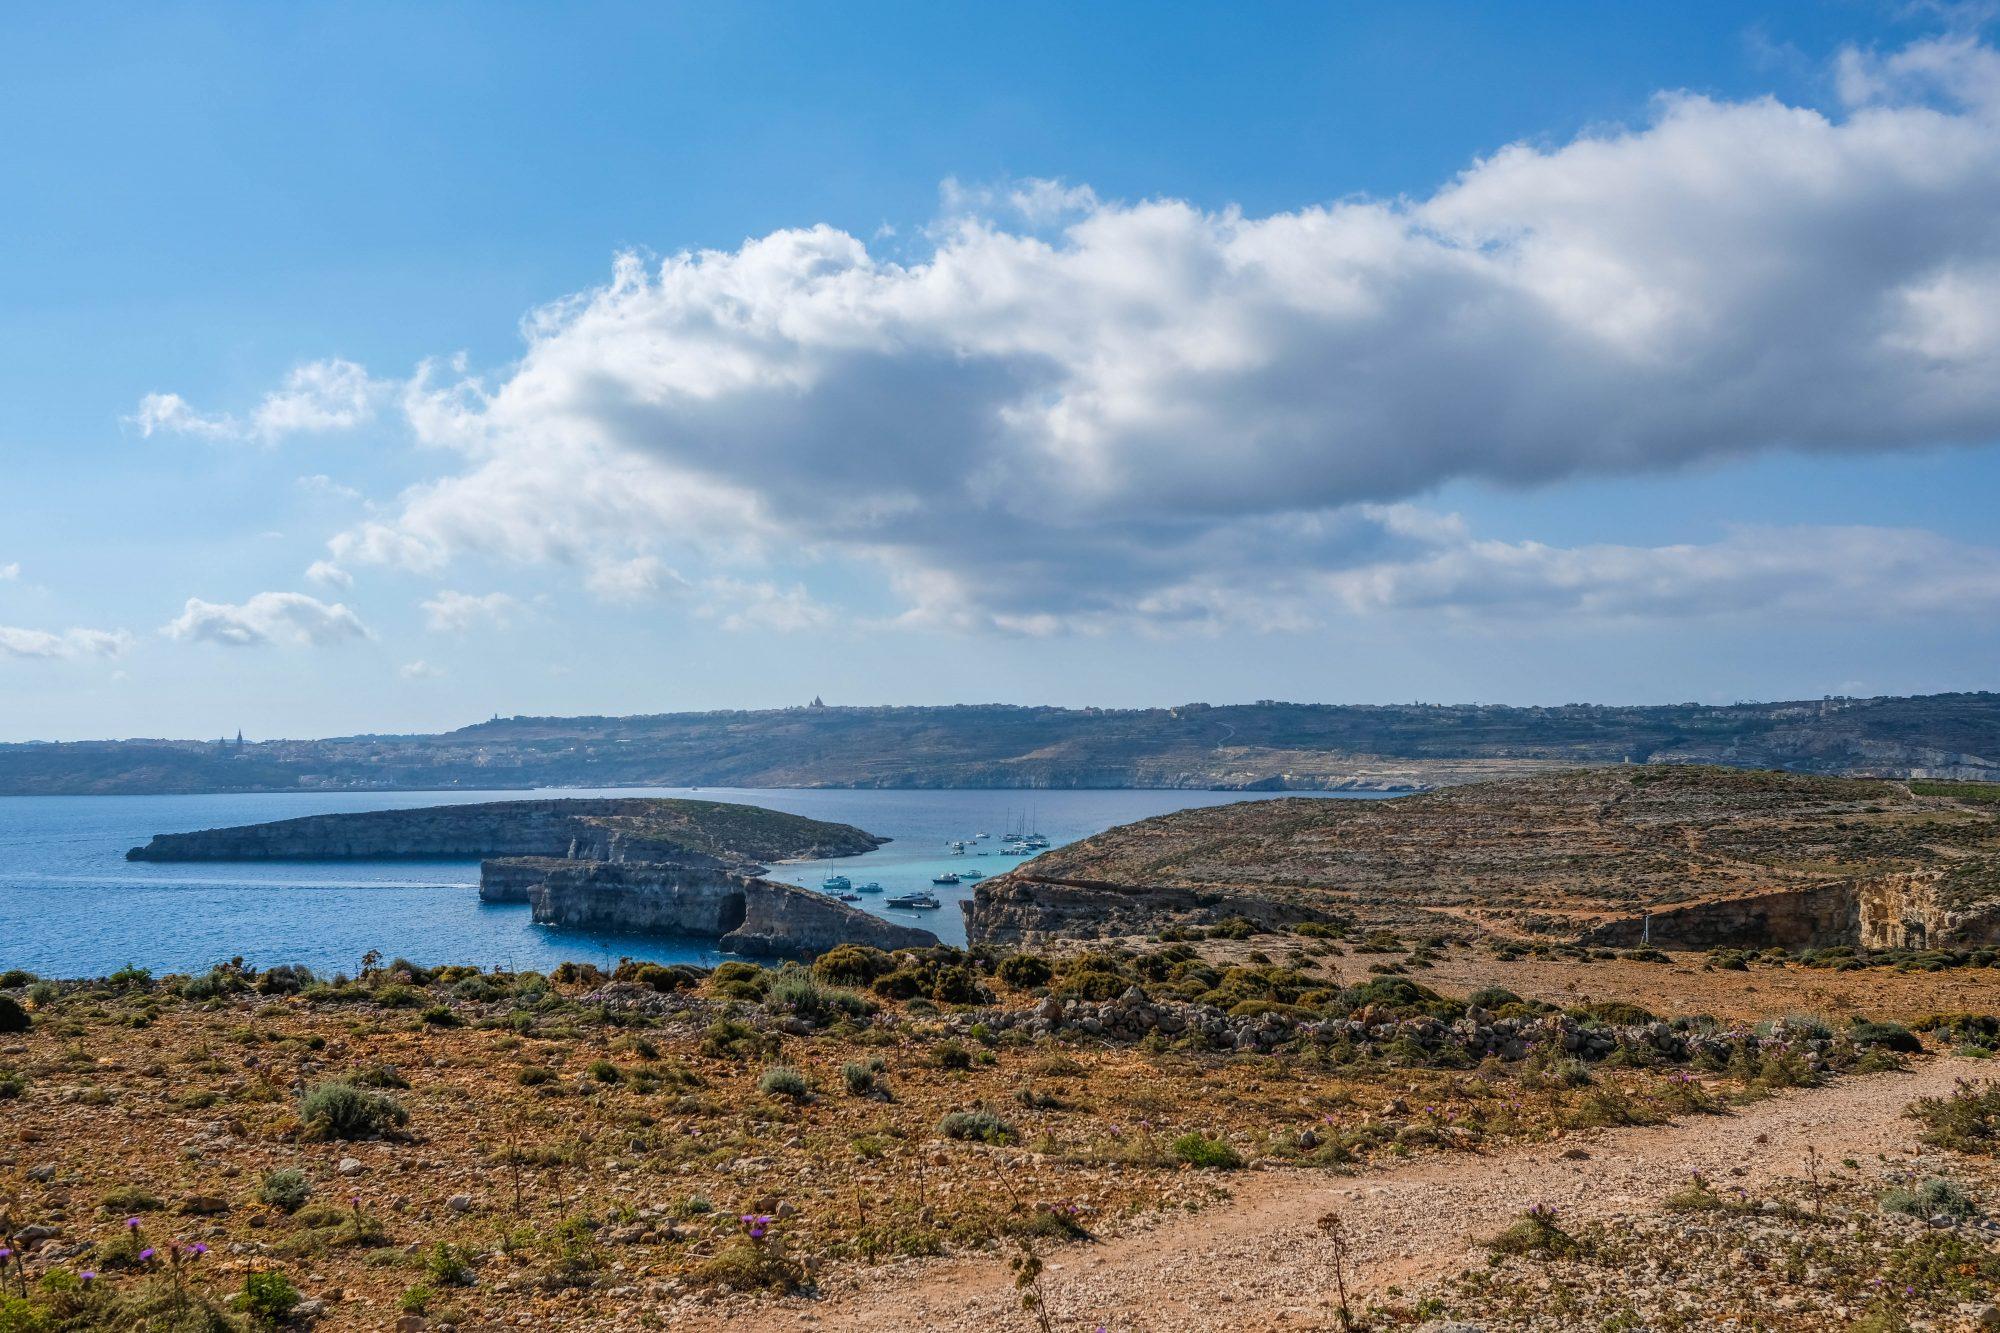 Desert - Comino, Malte